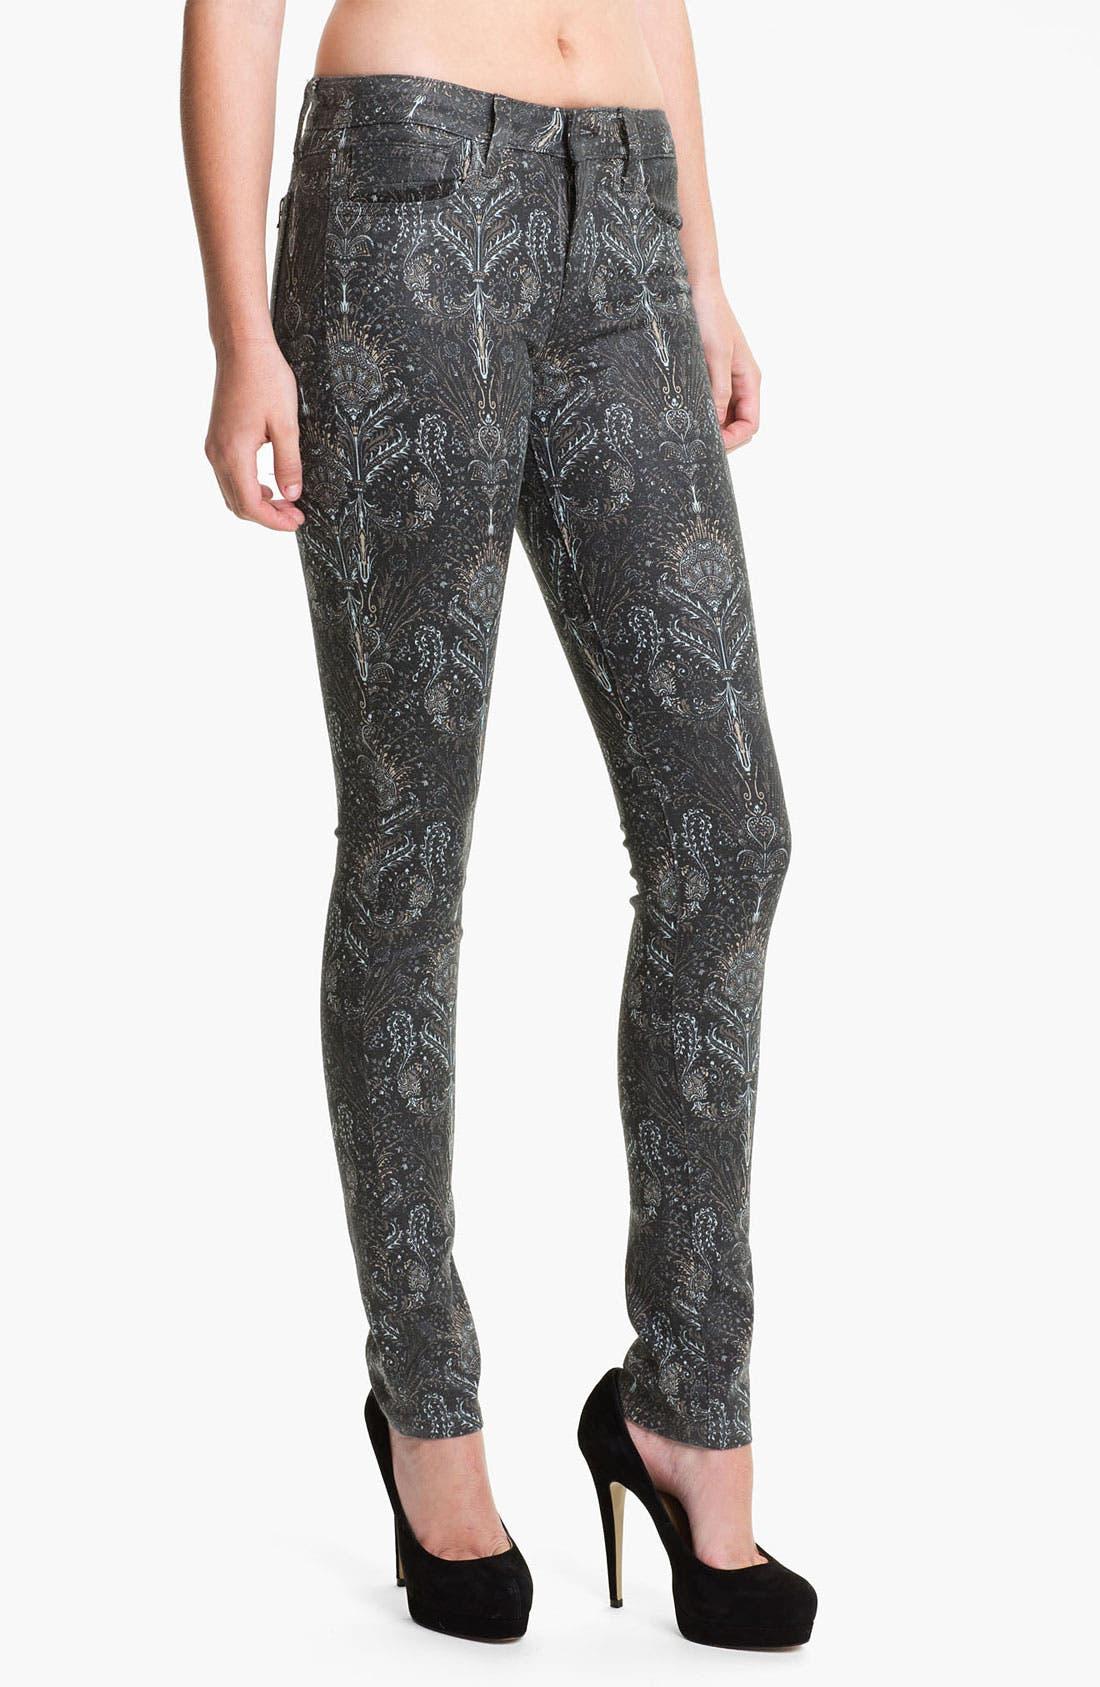 Alternate Image 1 Selected - Joe's Skinny Coated Jeans (Black Baroque)